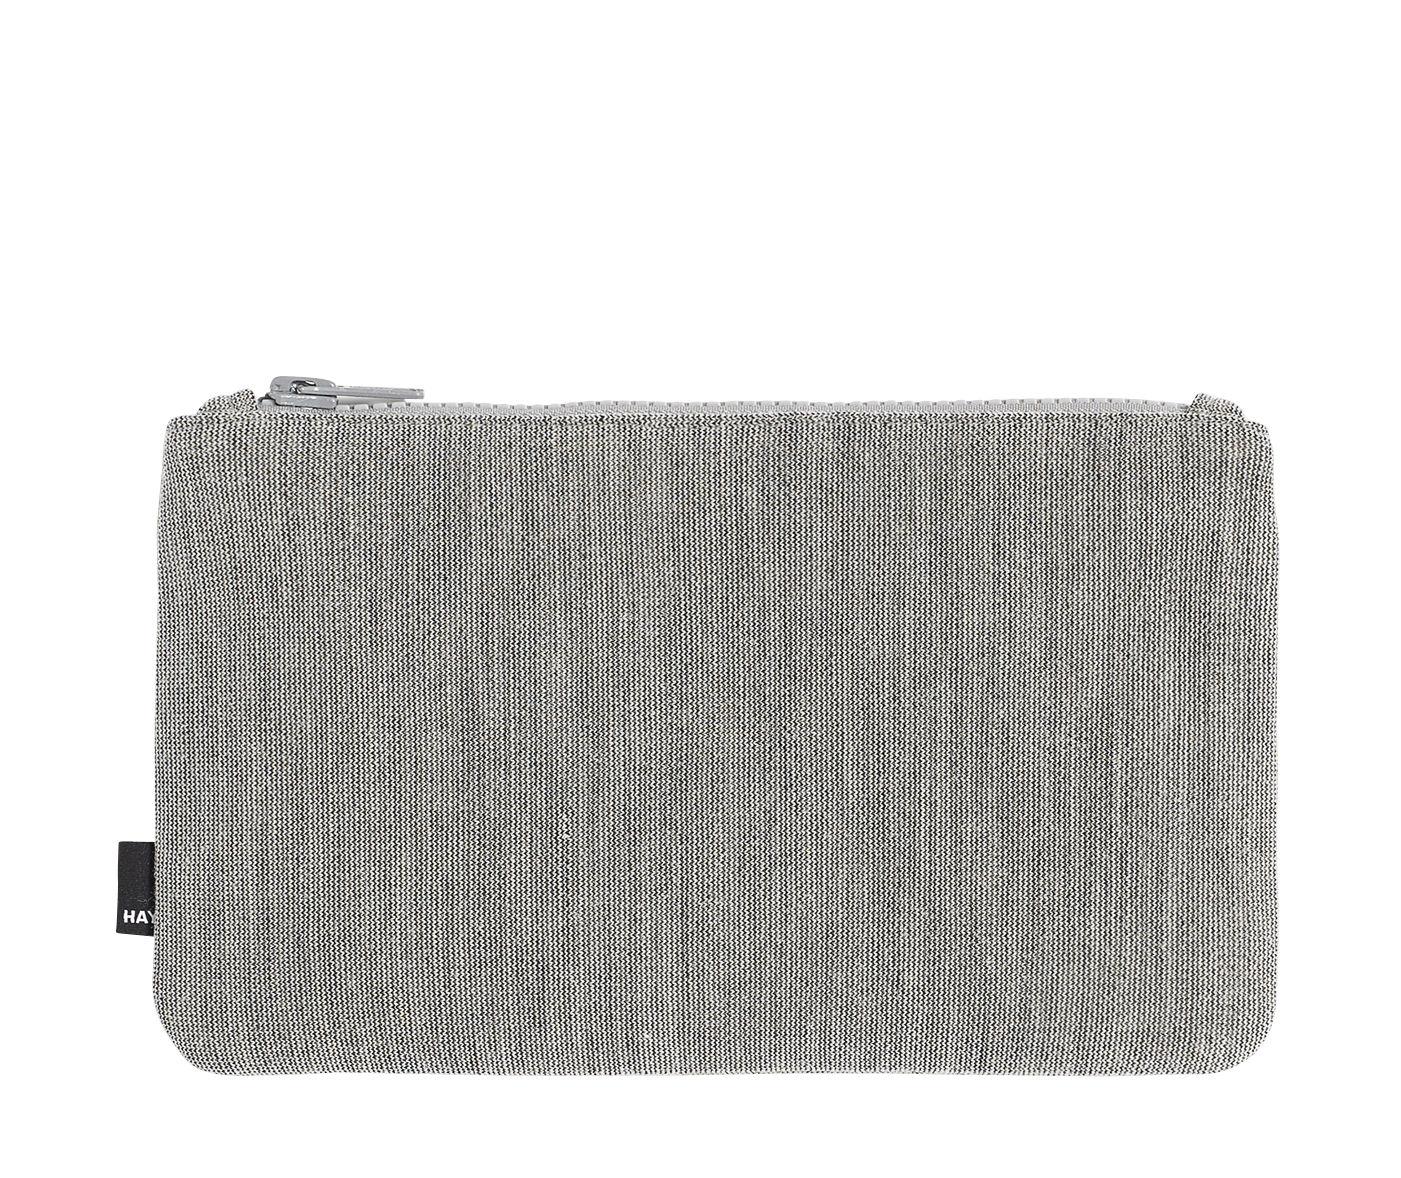 Accessories - Bags, Purses & Luggage - Zip Medium Case - L 22,5 x H 14 cm by Hay - Light grey - Kvadrat fabric